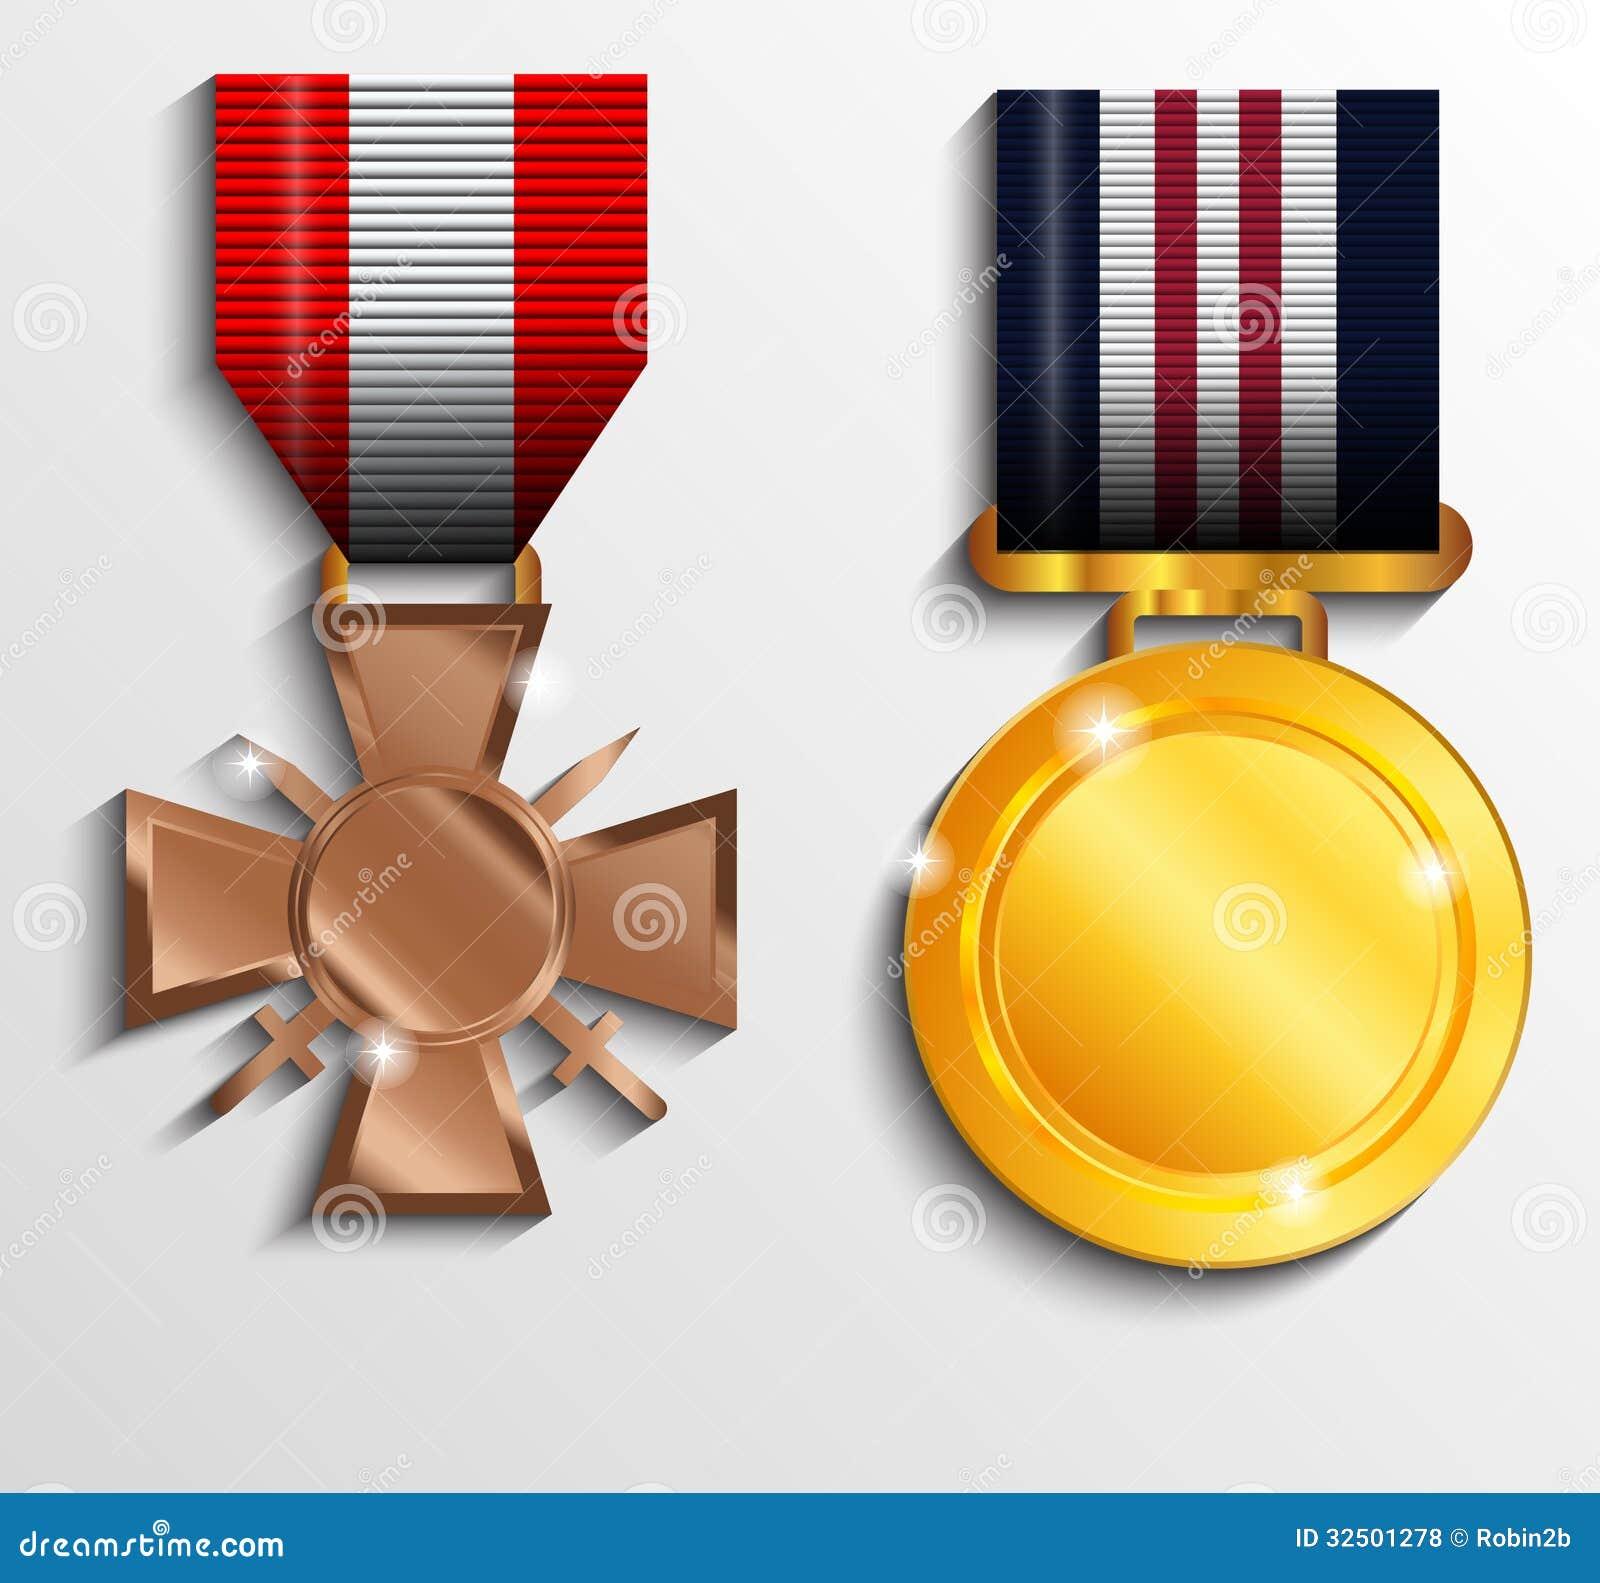 Military Medal Royalty Free Stock Photos - Image: 32501278 Baby Stroller Cartoon